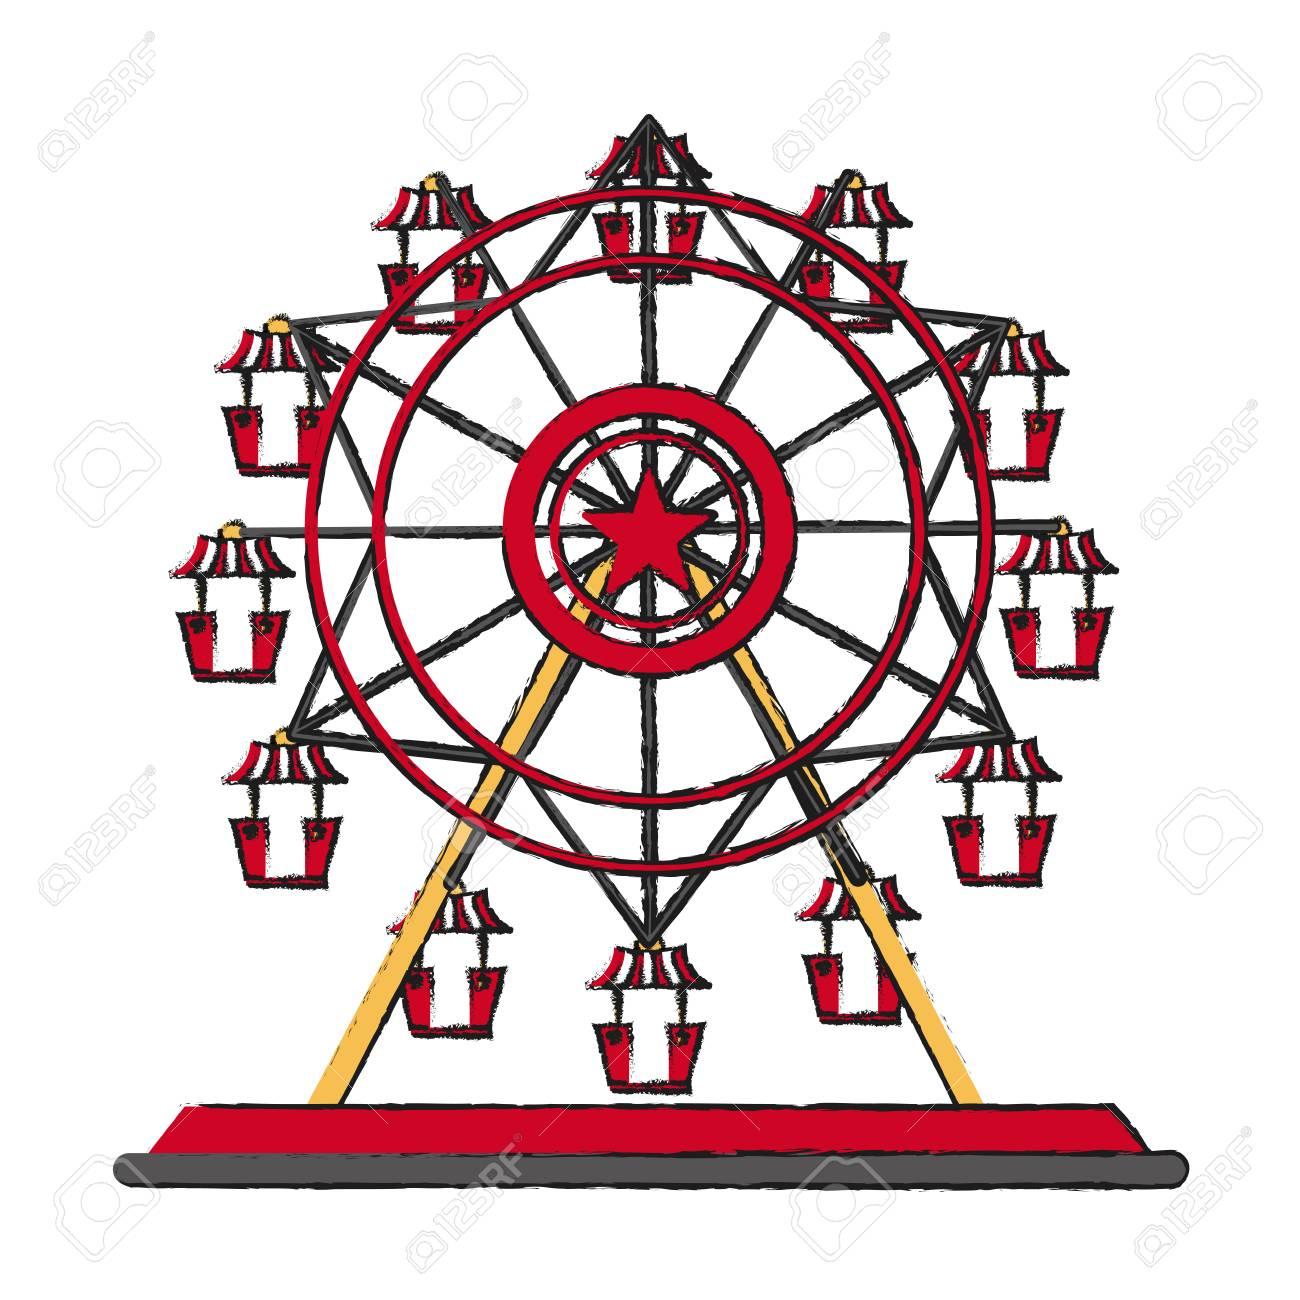 Carnival ferris wheel icon..